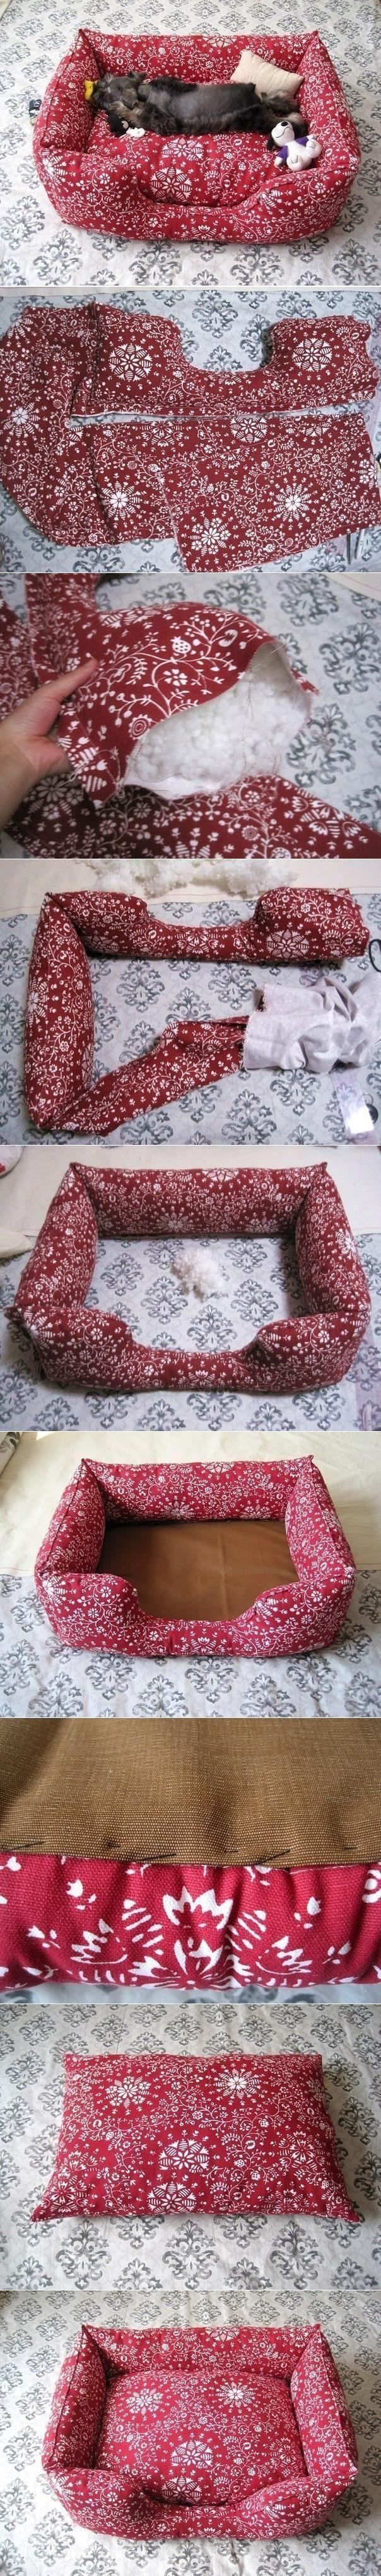 diy fabric pet sofa diy fabric pet sofa i wish i could make the puppies - Diy Tagesliege Mit Baldachin